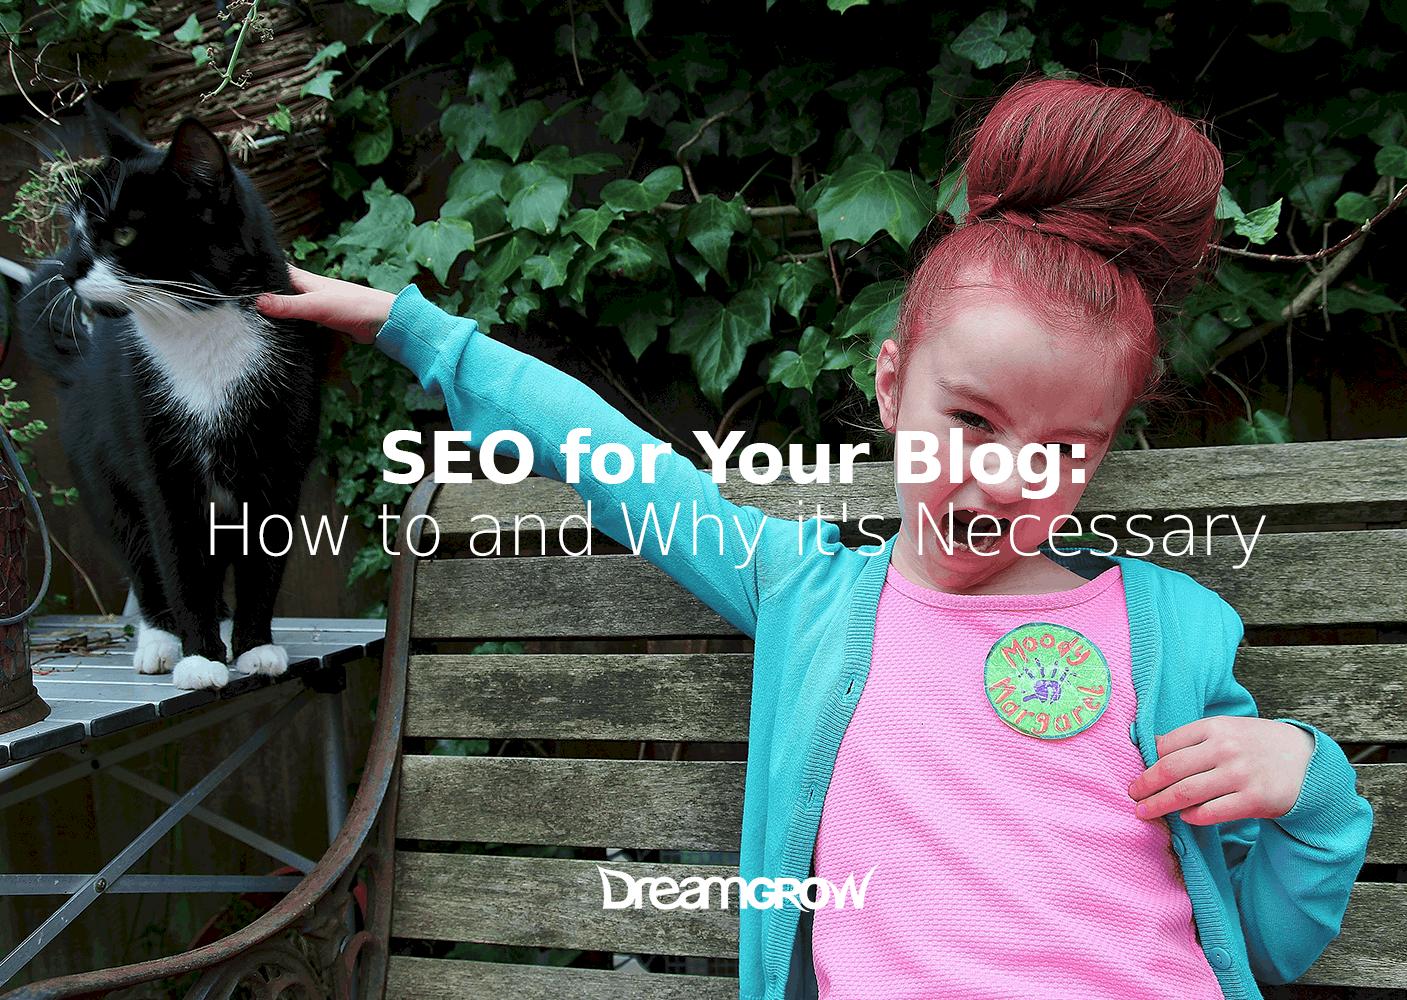 seo-for-blog-dreamgrow